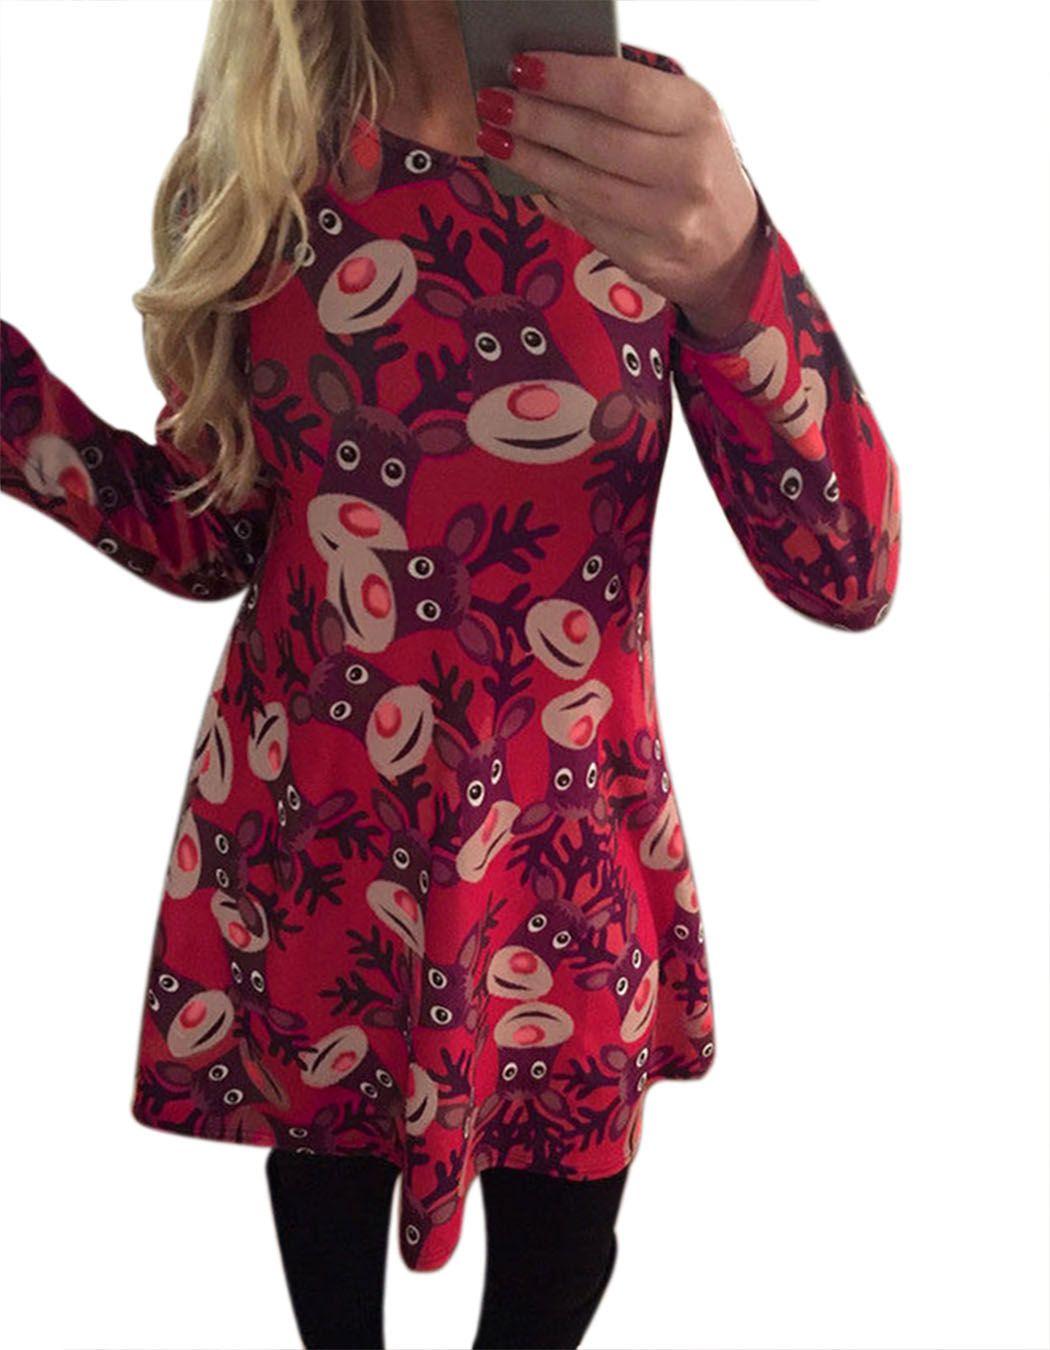 Chrismas Clothes Women Xmas Sa nta Party Swing Flared Dress Christmas Long Sleeve Animal Print dress(China (Mainland))